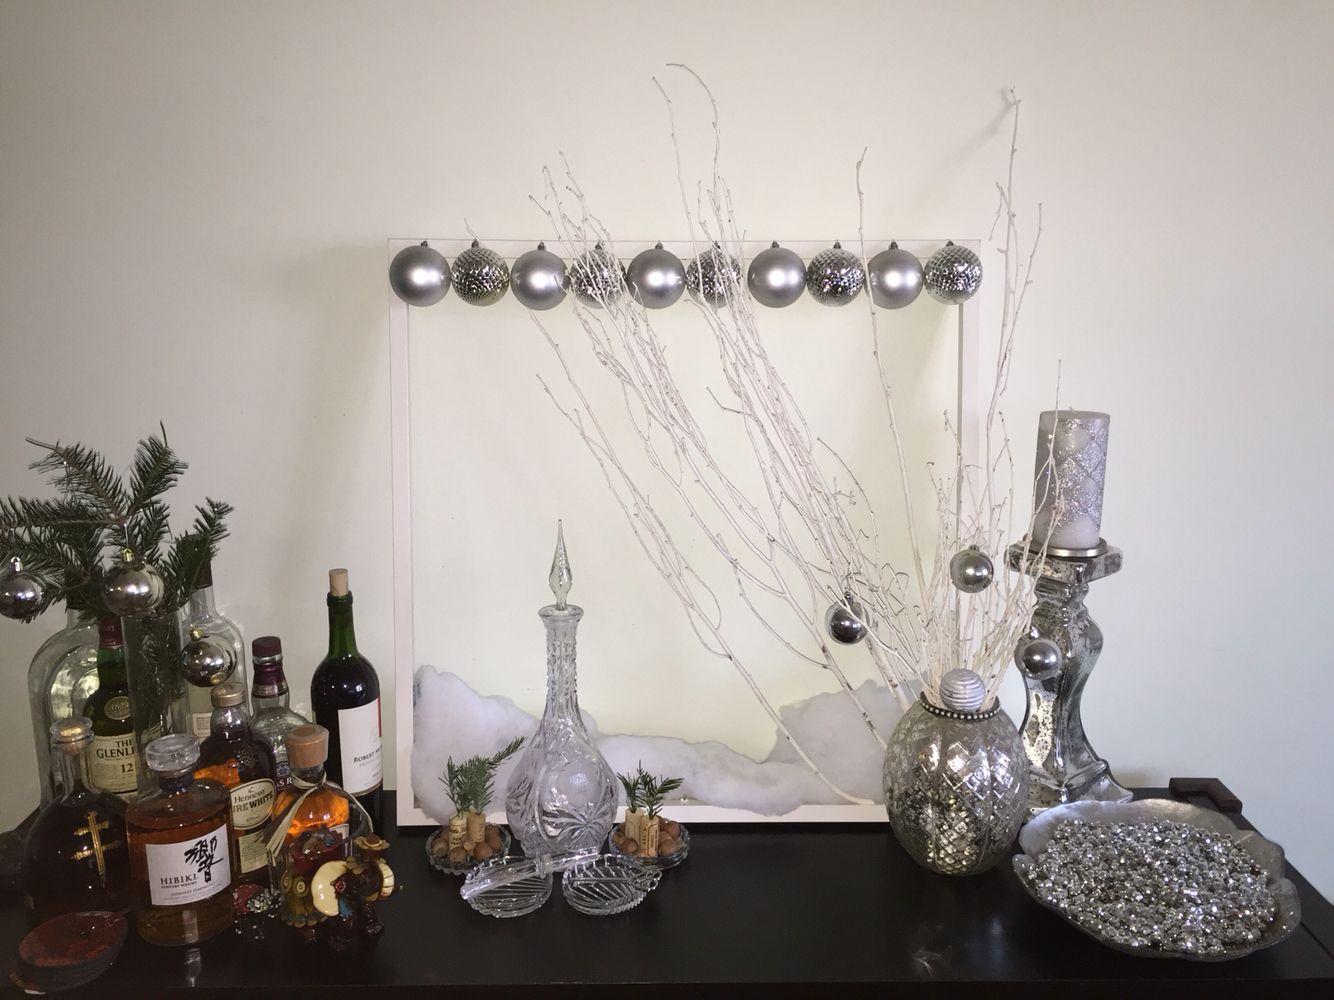 Fun diy Christmas decorations